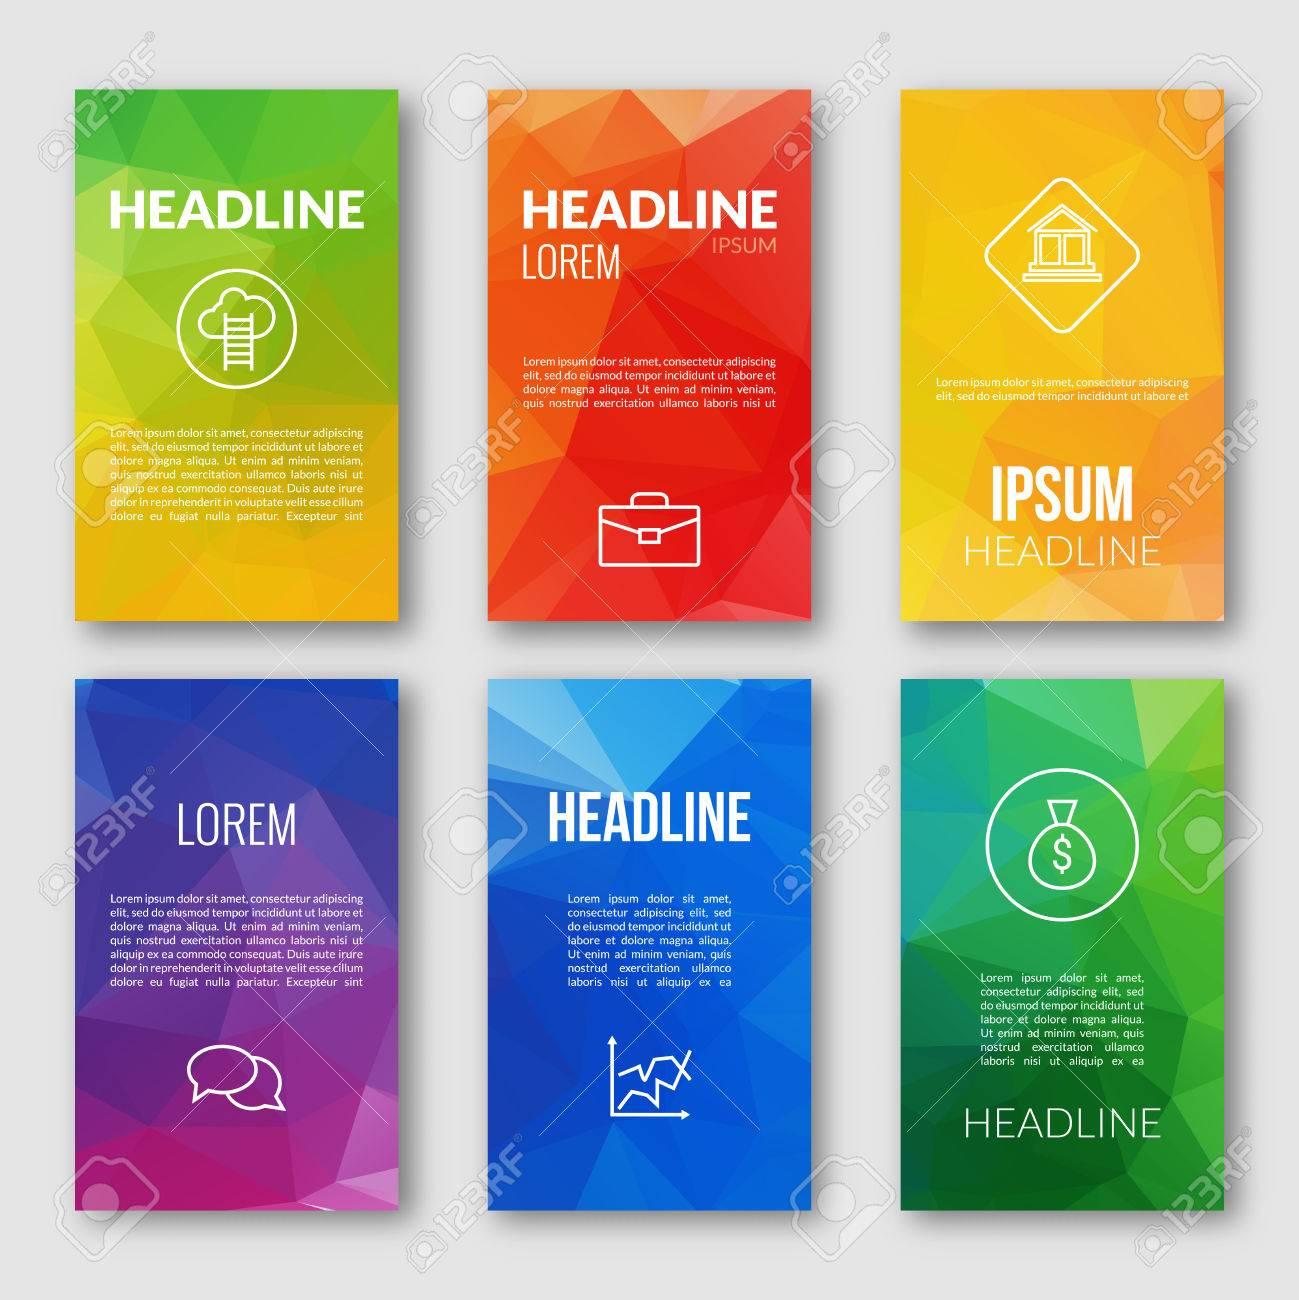 Web Design Set Template, Business triangular banners, Brochures. Mobile, Technology. Infographic Concept. Web app design template. Mobile interface. UI template. Web UI app design - 57757271